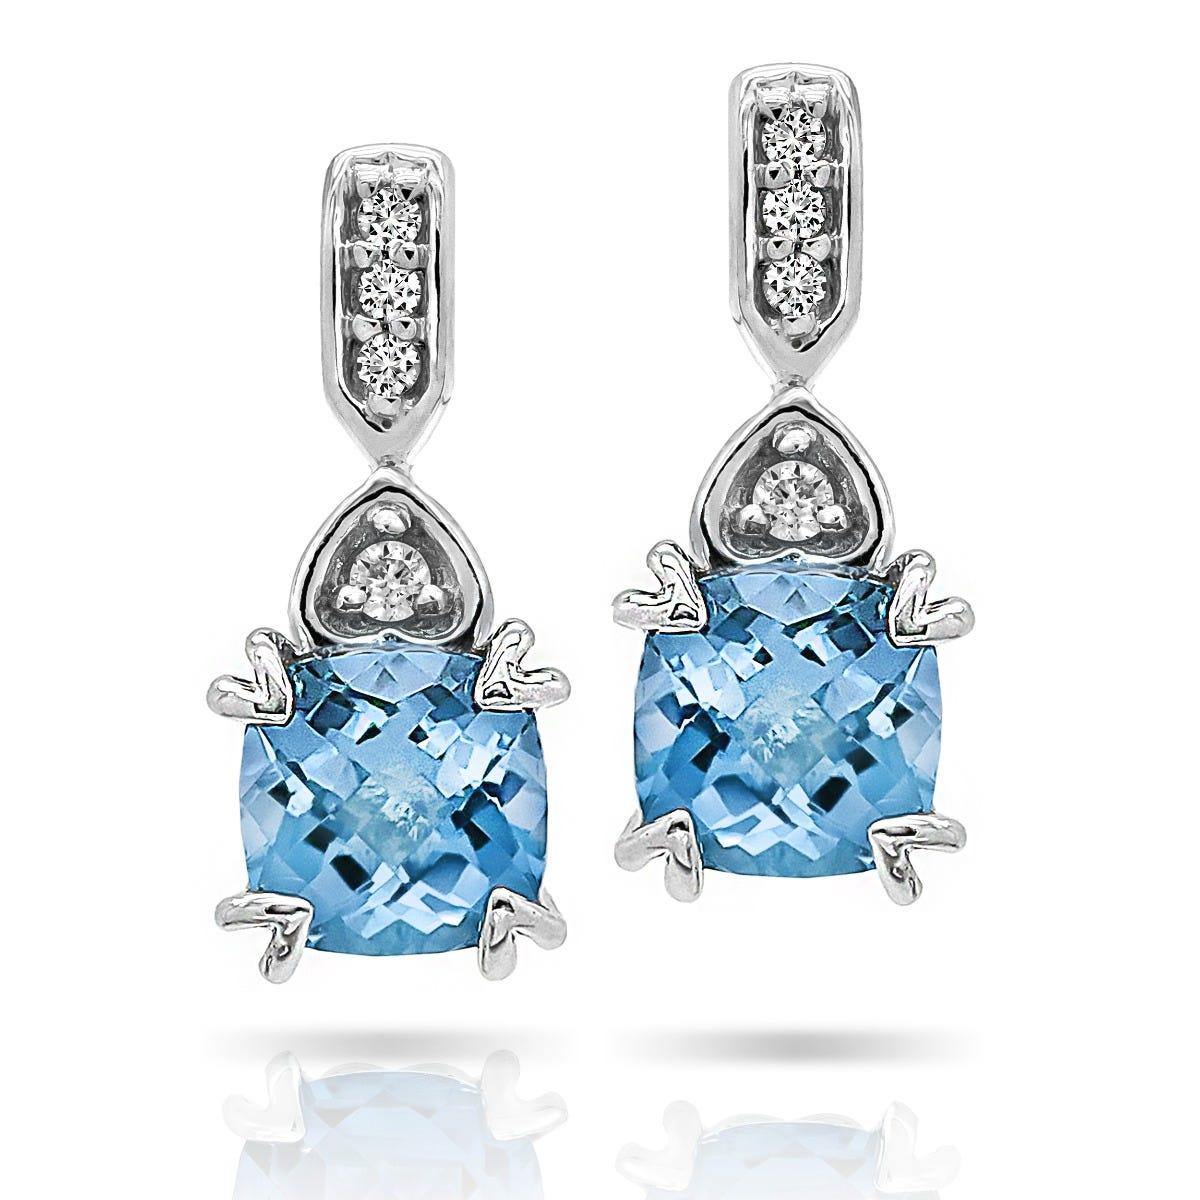 Cushion Blue Topaz & Diamond Drop Fashion Earrings in 10k White Gold